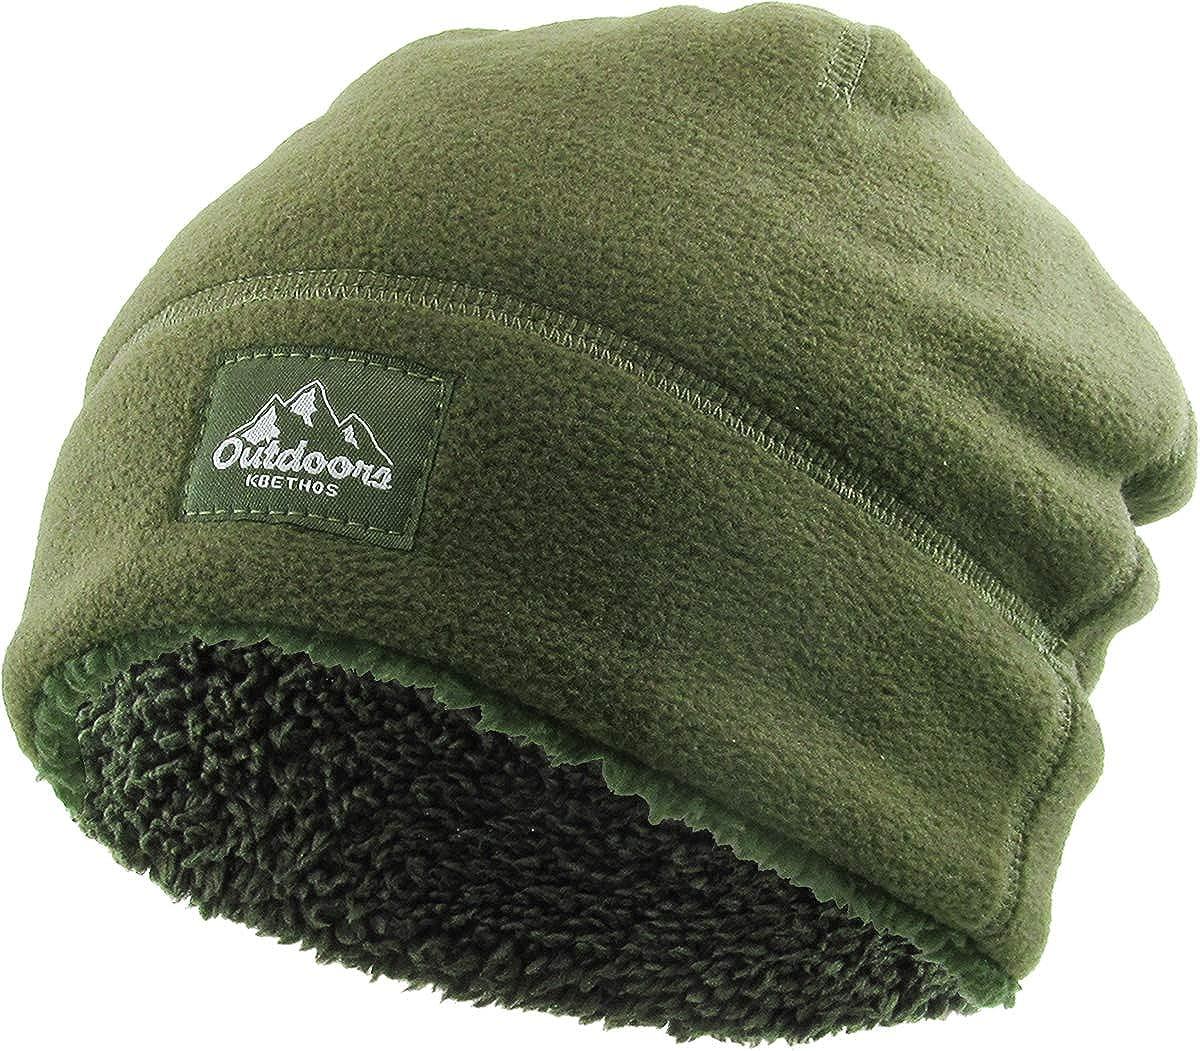 KBETHOS Solid Striped Dotted Sherpa Fleece Short Beanie Skull Cap Men Women Winter Ski Hat